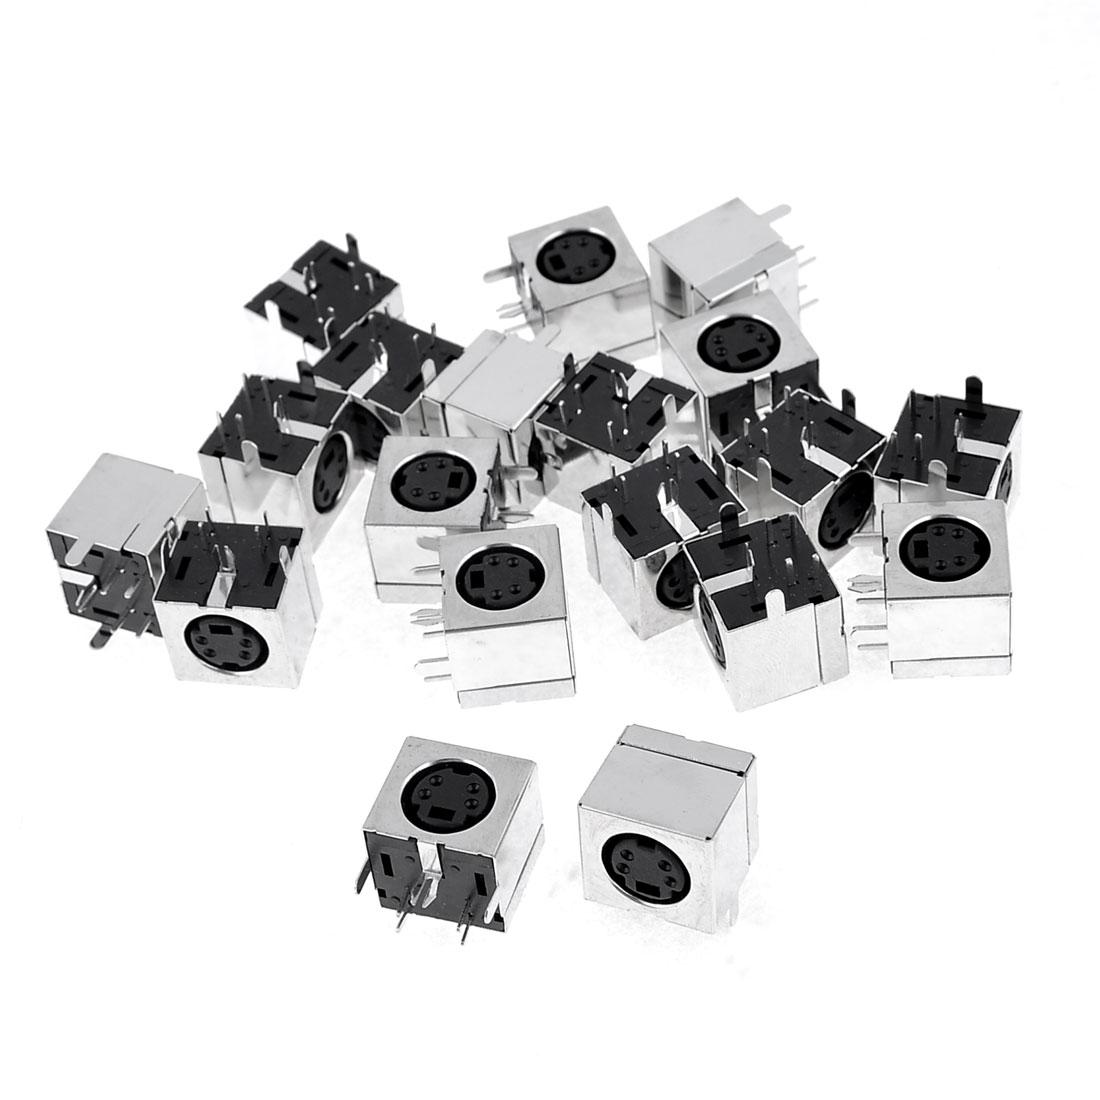 20 Pcs Silver Tone Metal Case S-Video 4 Pins Mini DIN Female Socket